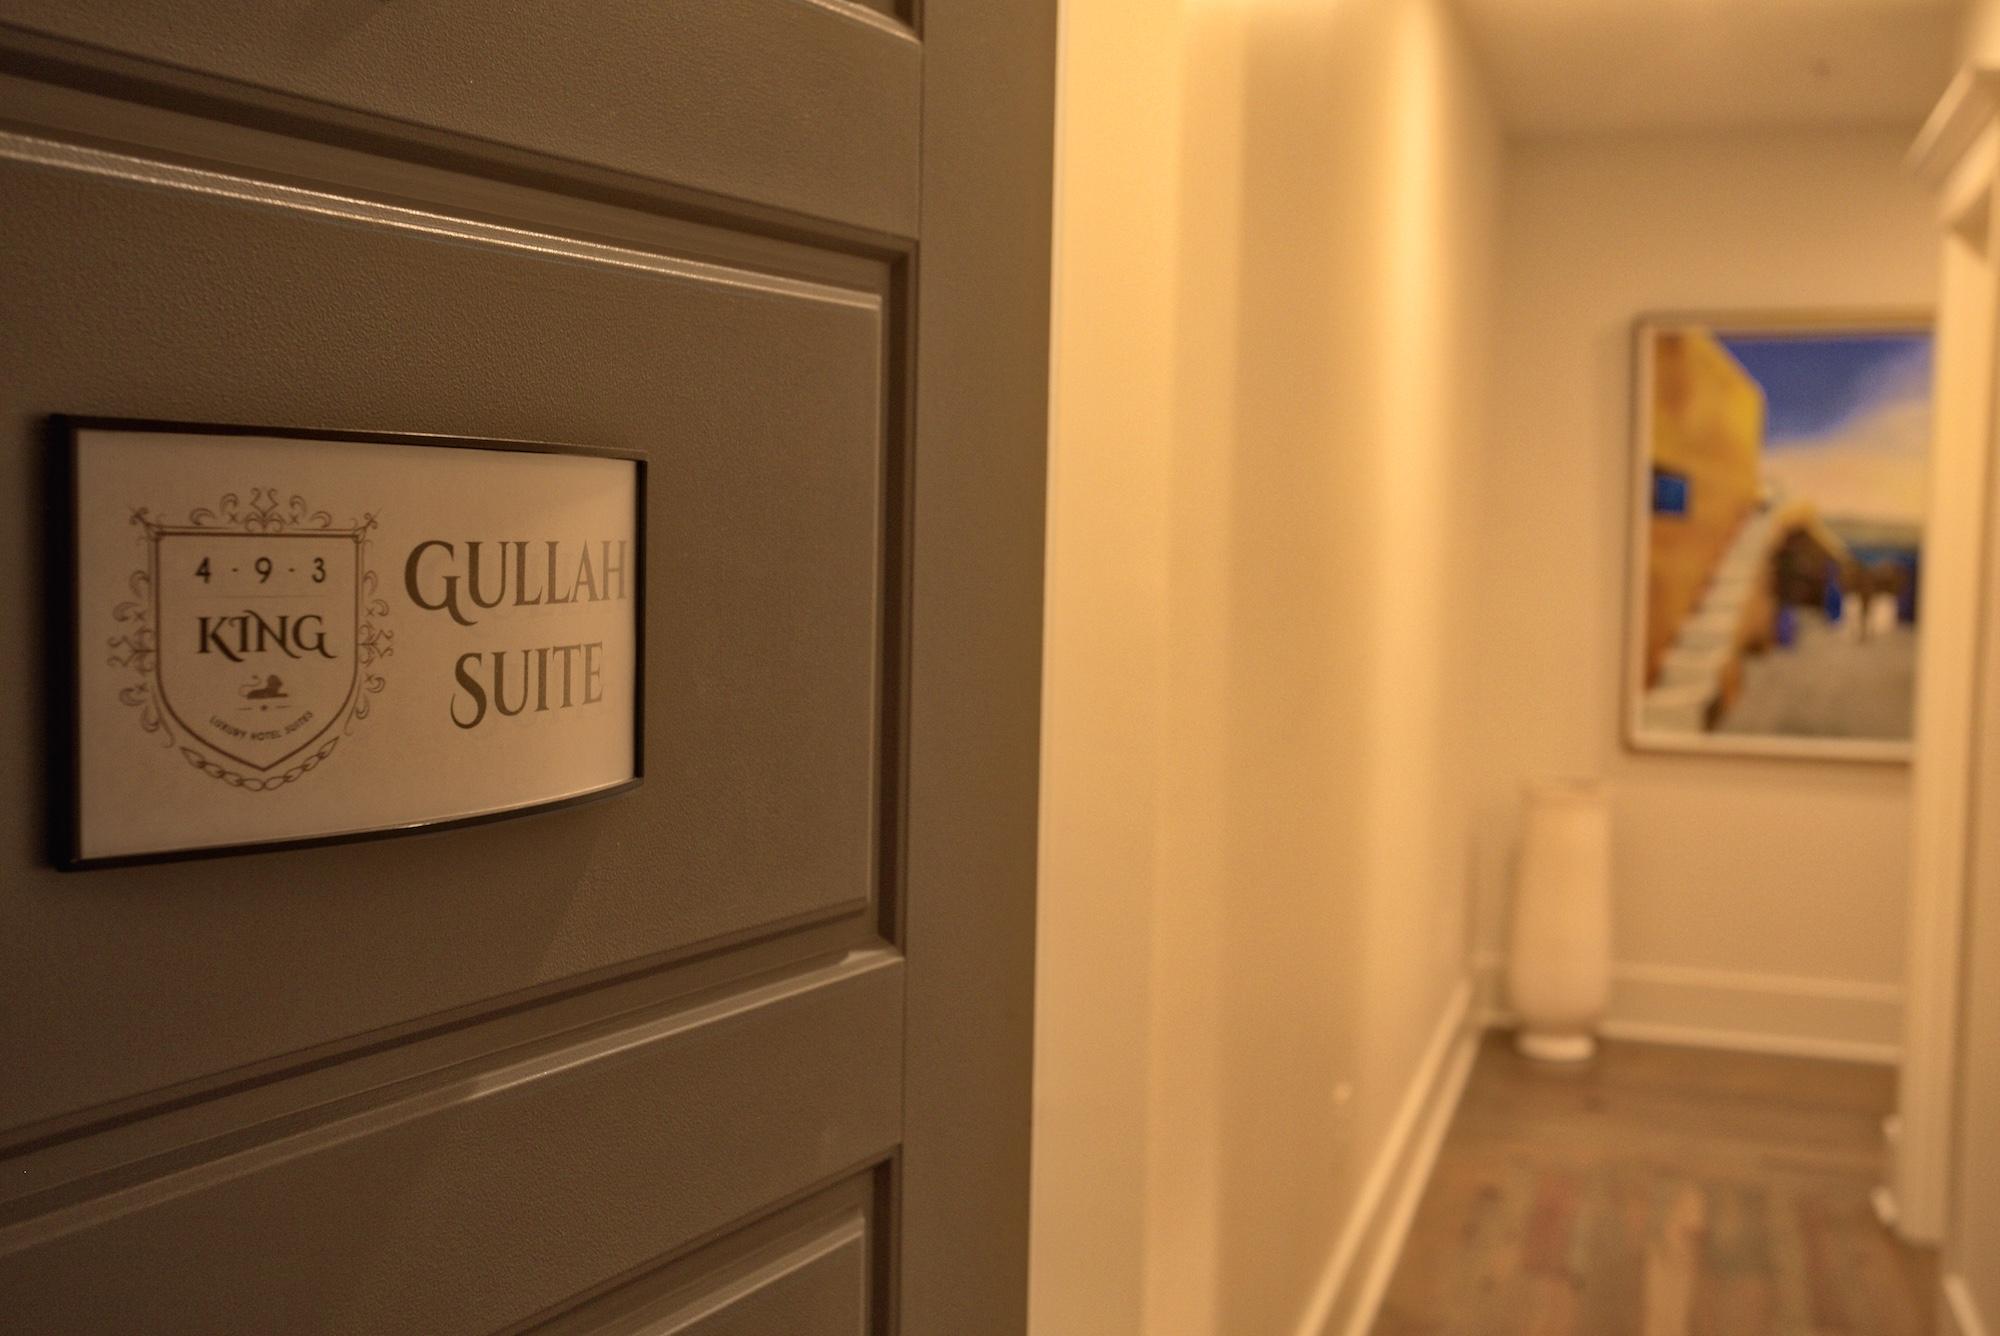 King Street Luxury Boutique Hotel The Gullah Charleston SC 6.jpeg